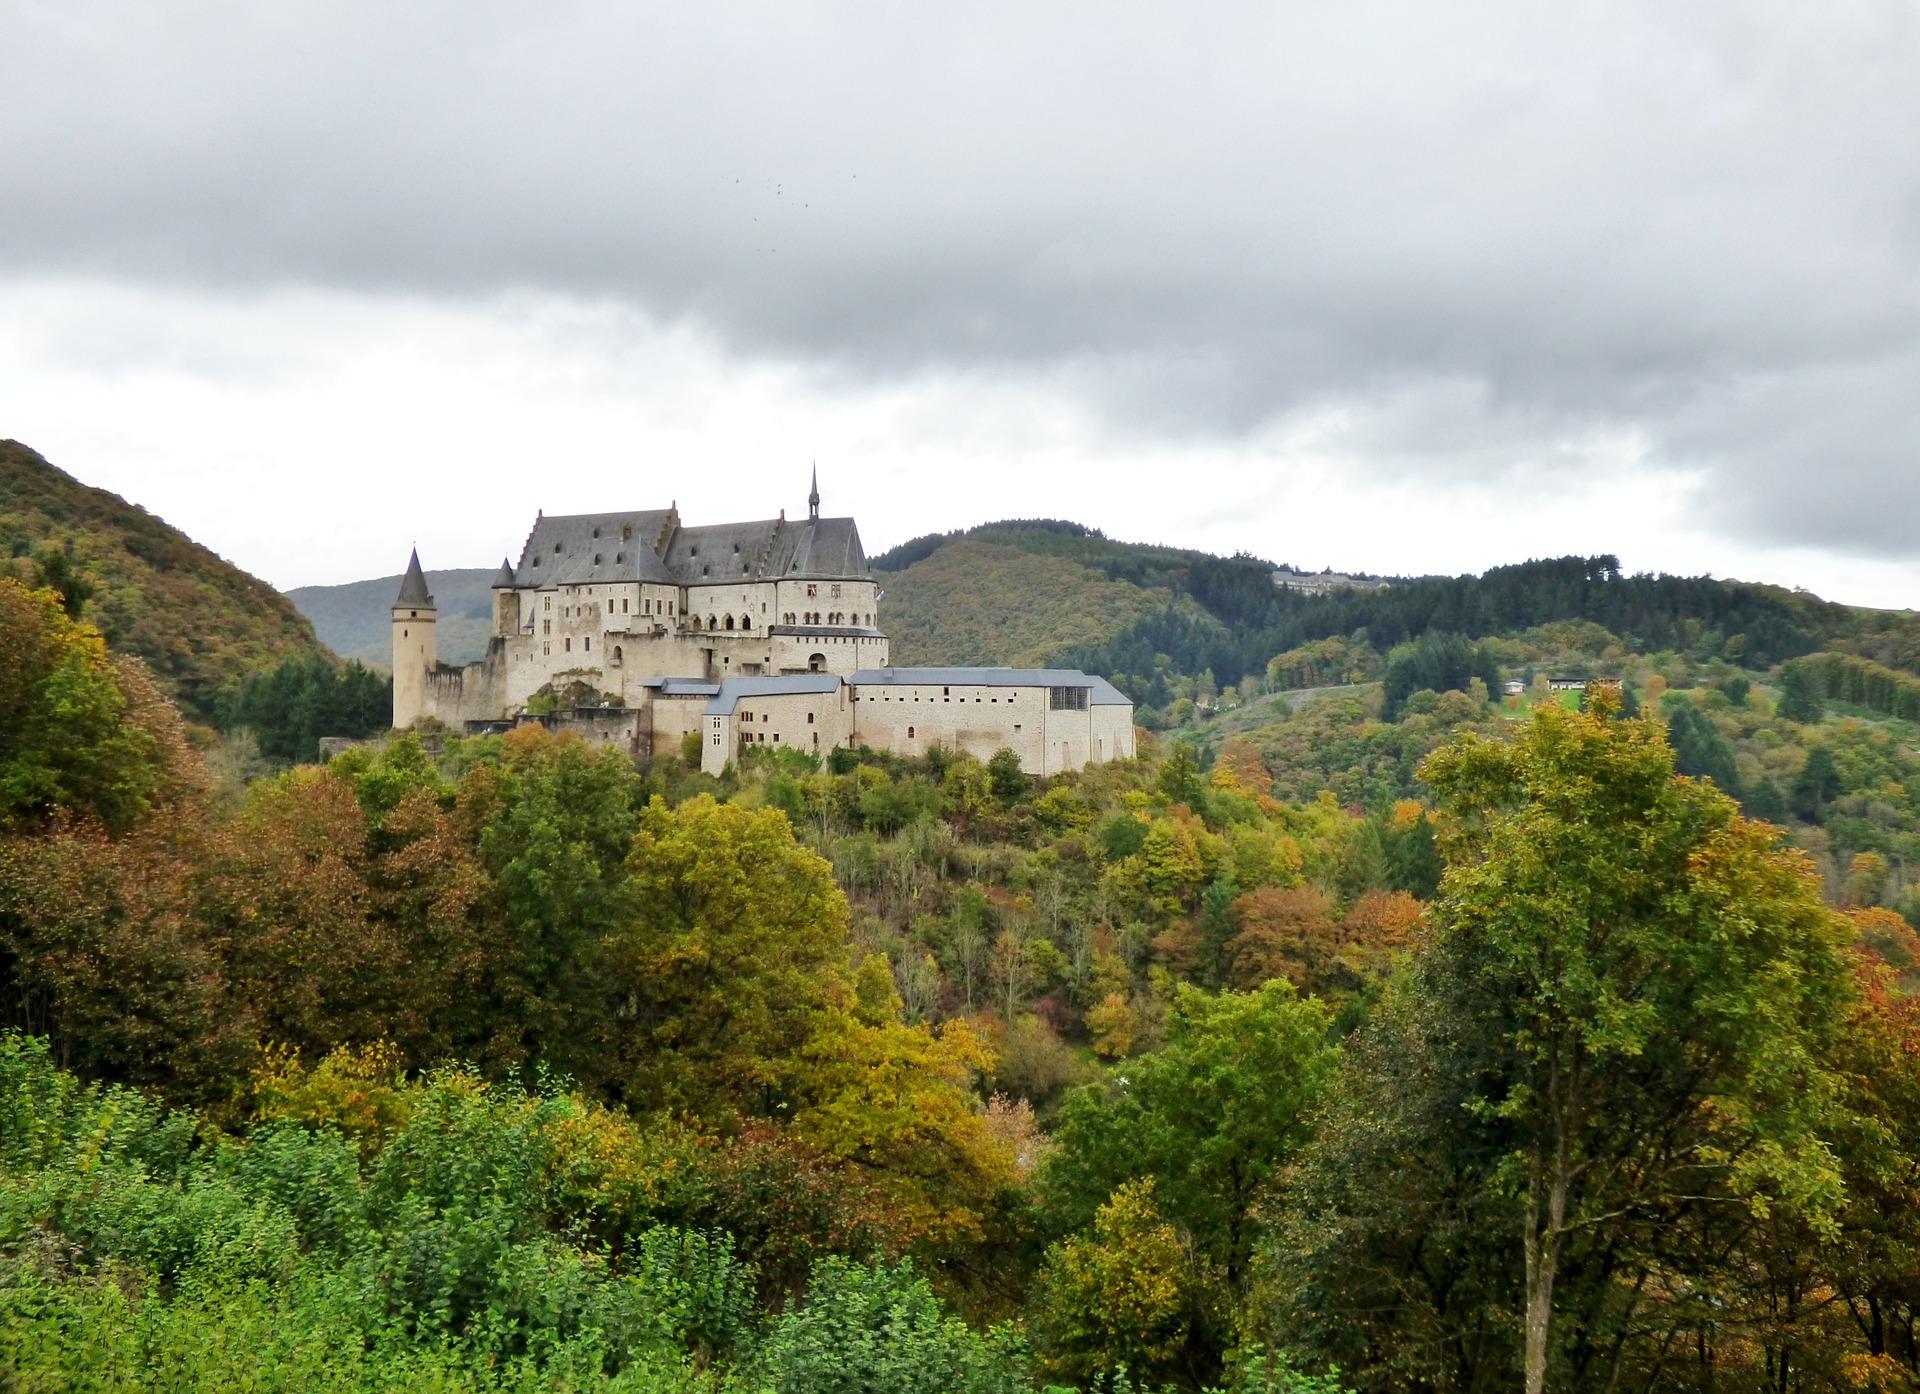 Image of the Vianden Castle